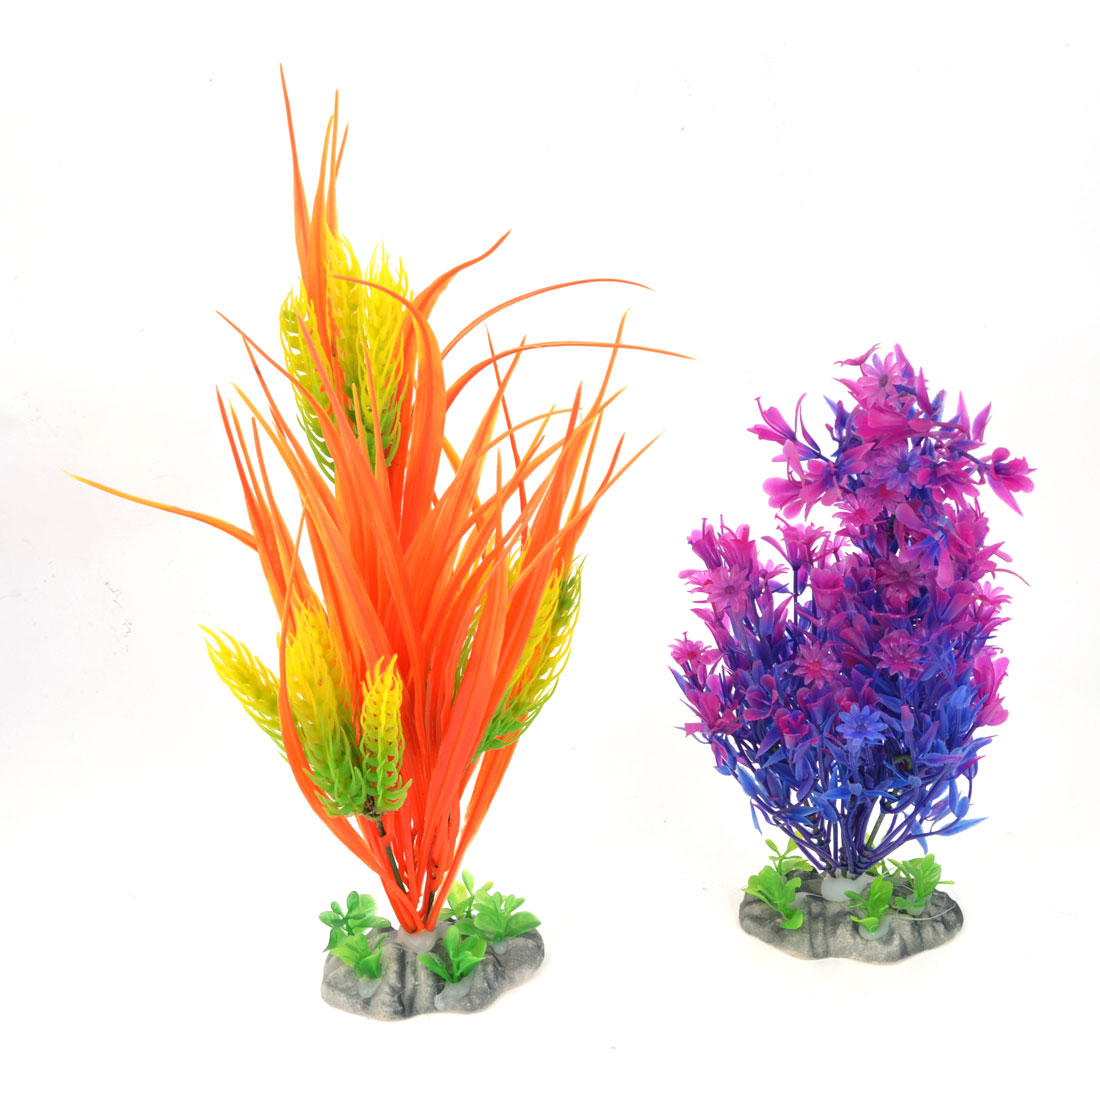 Fish Tank Artificial Multicolored Water Grass Ornament 33cm 27cm Height 2 PCS